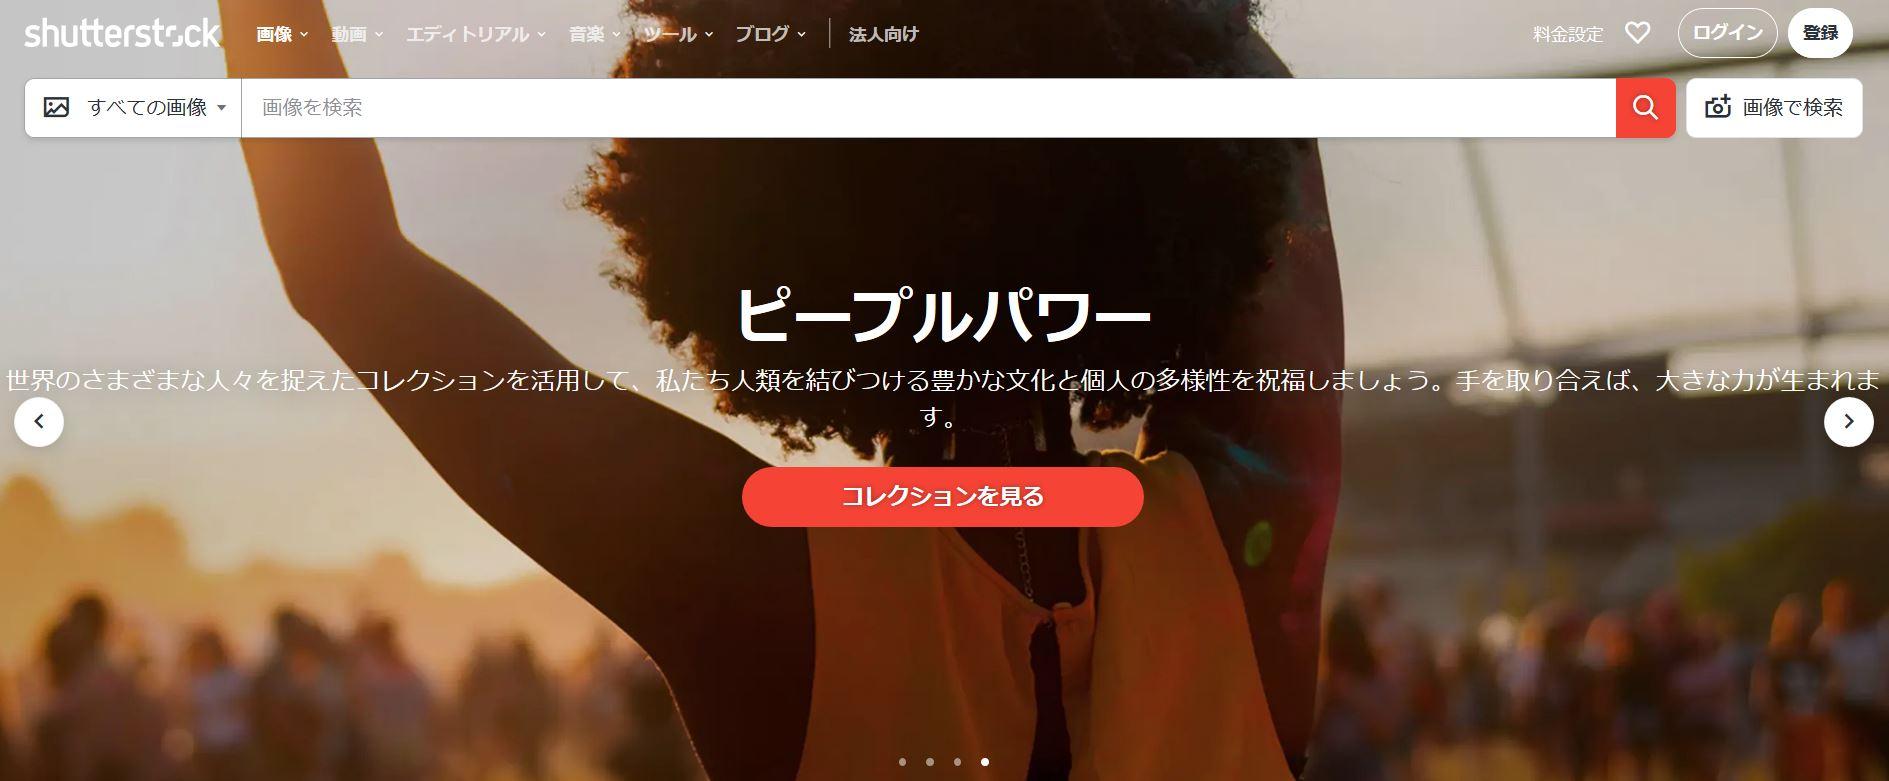 Shutterstockの画像